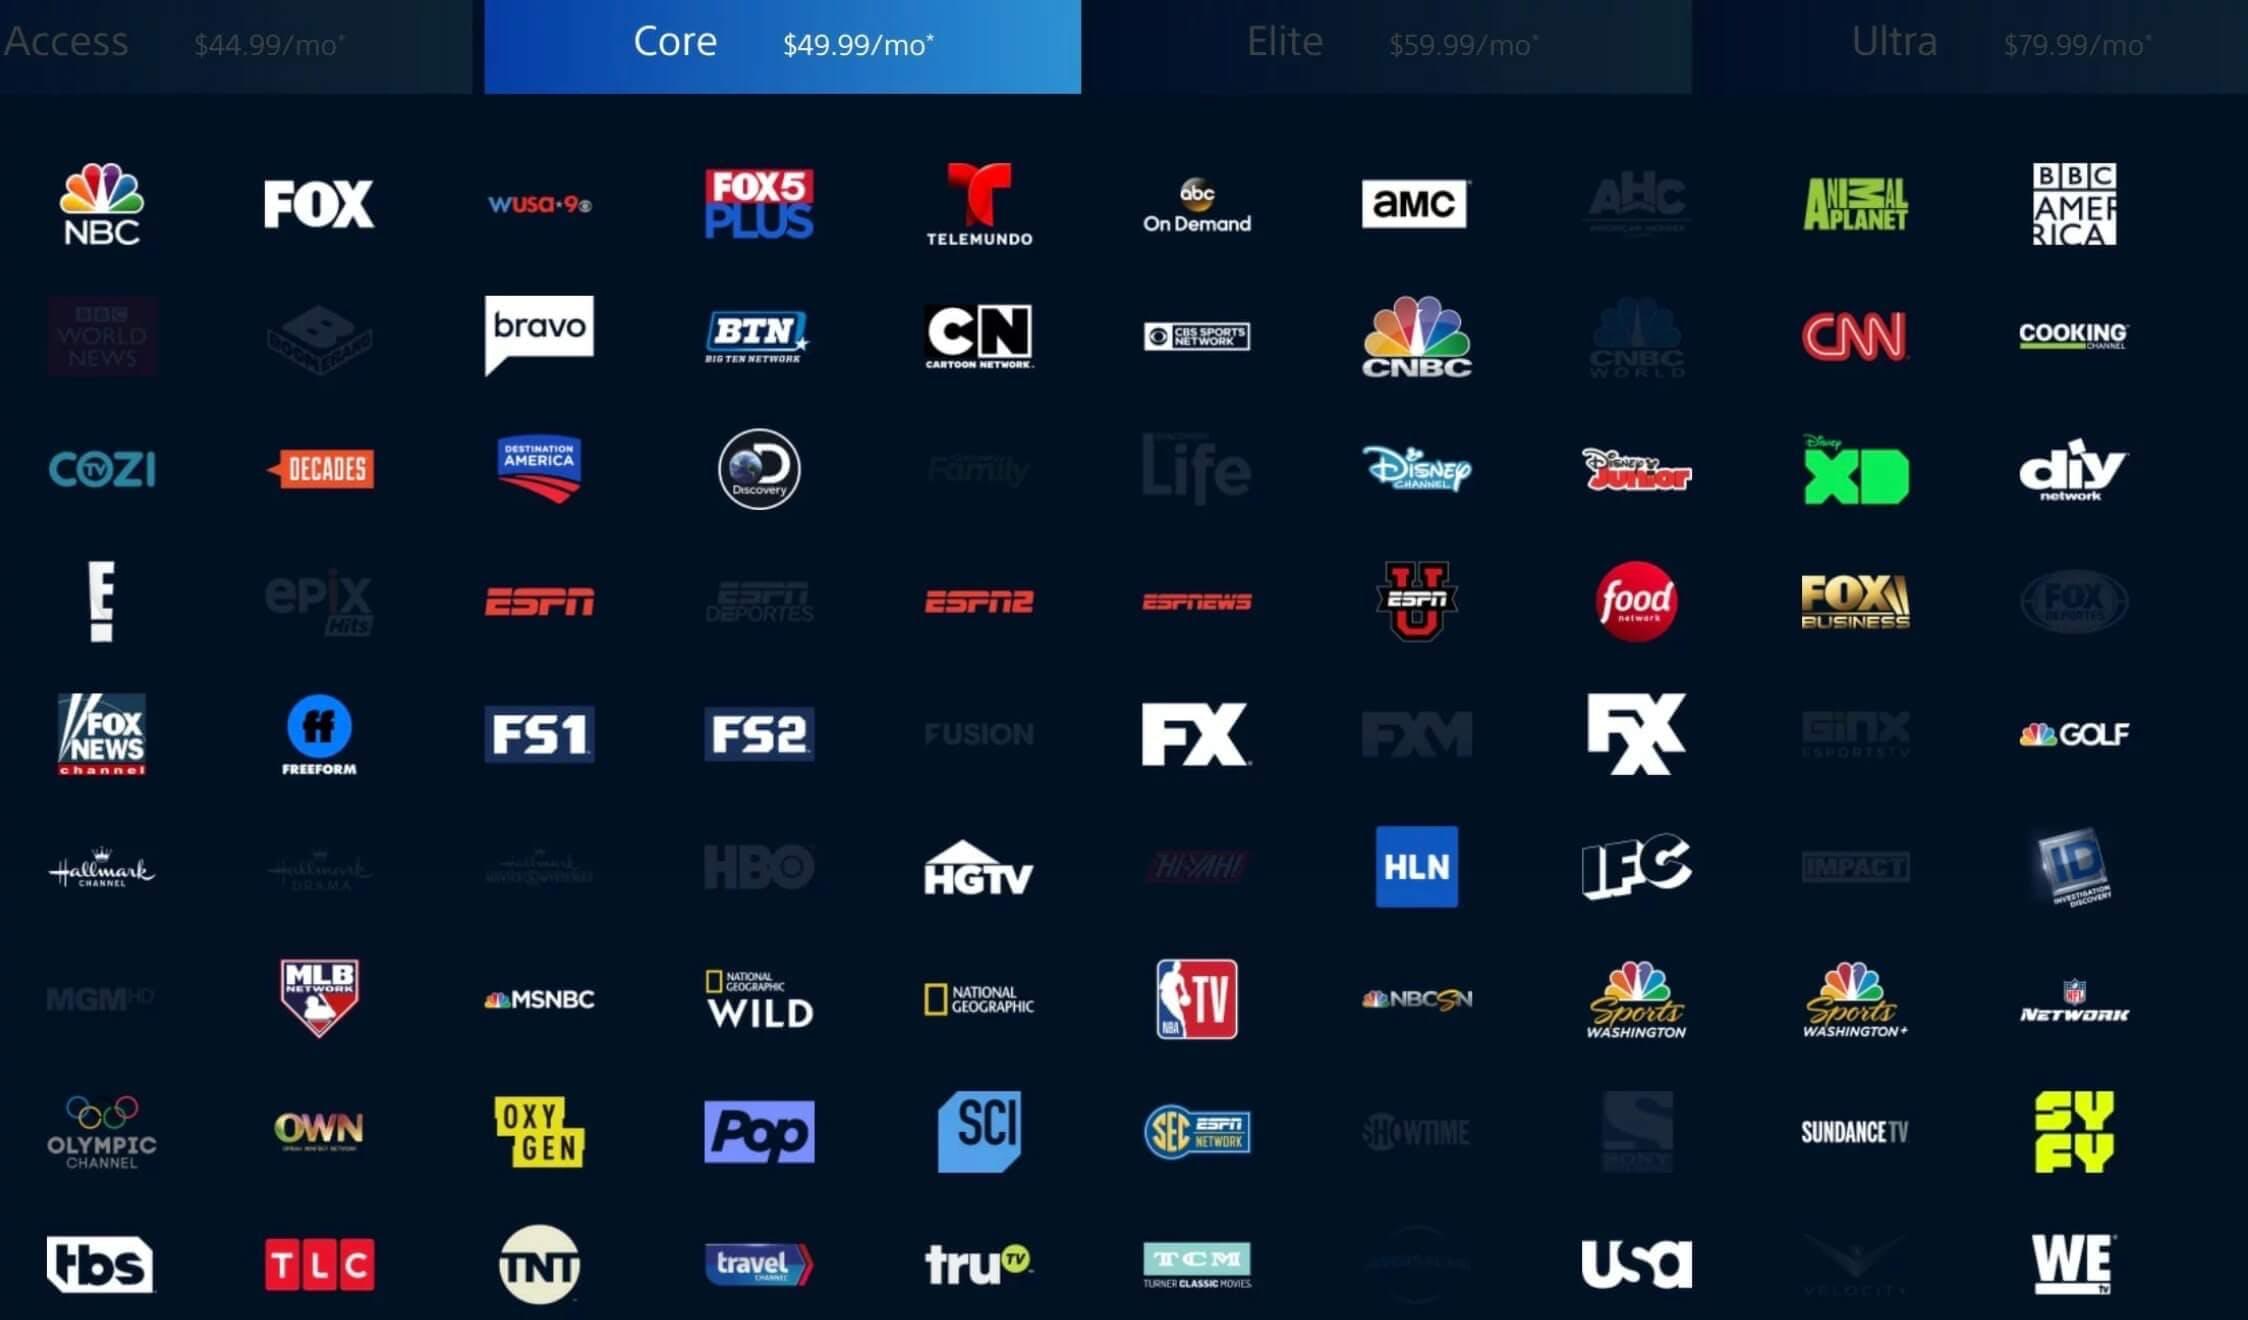 https://www.playstation.com/en-us/network/vue/